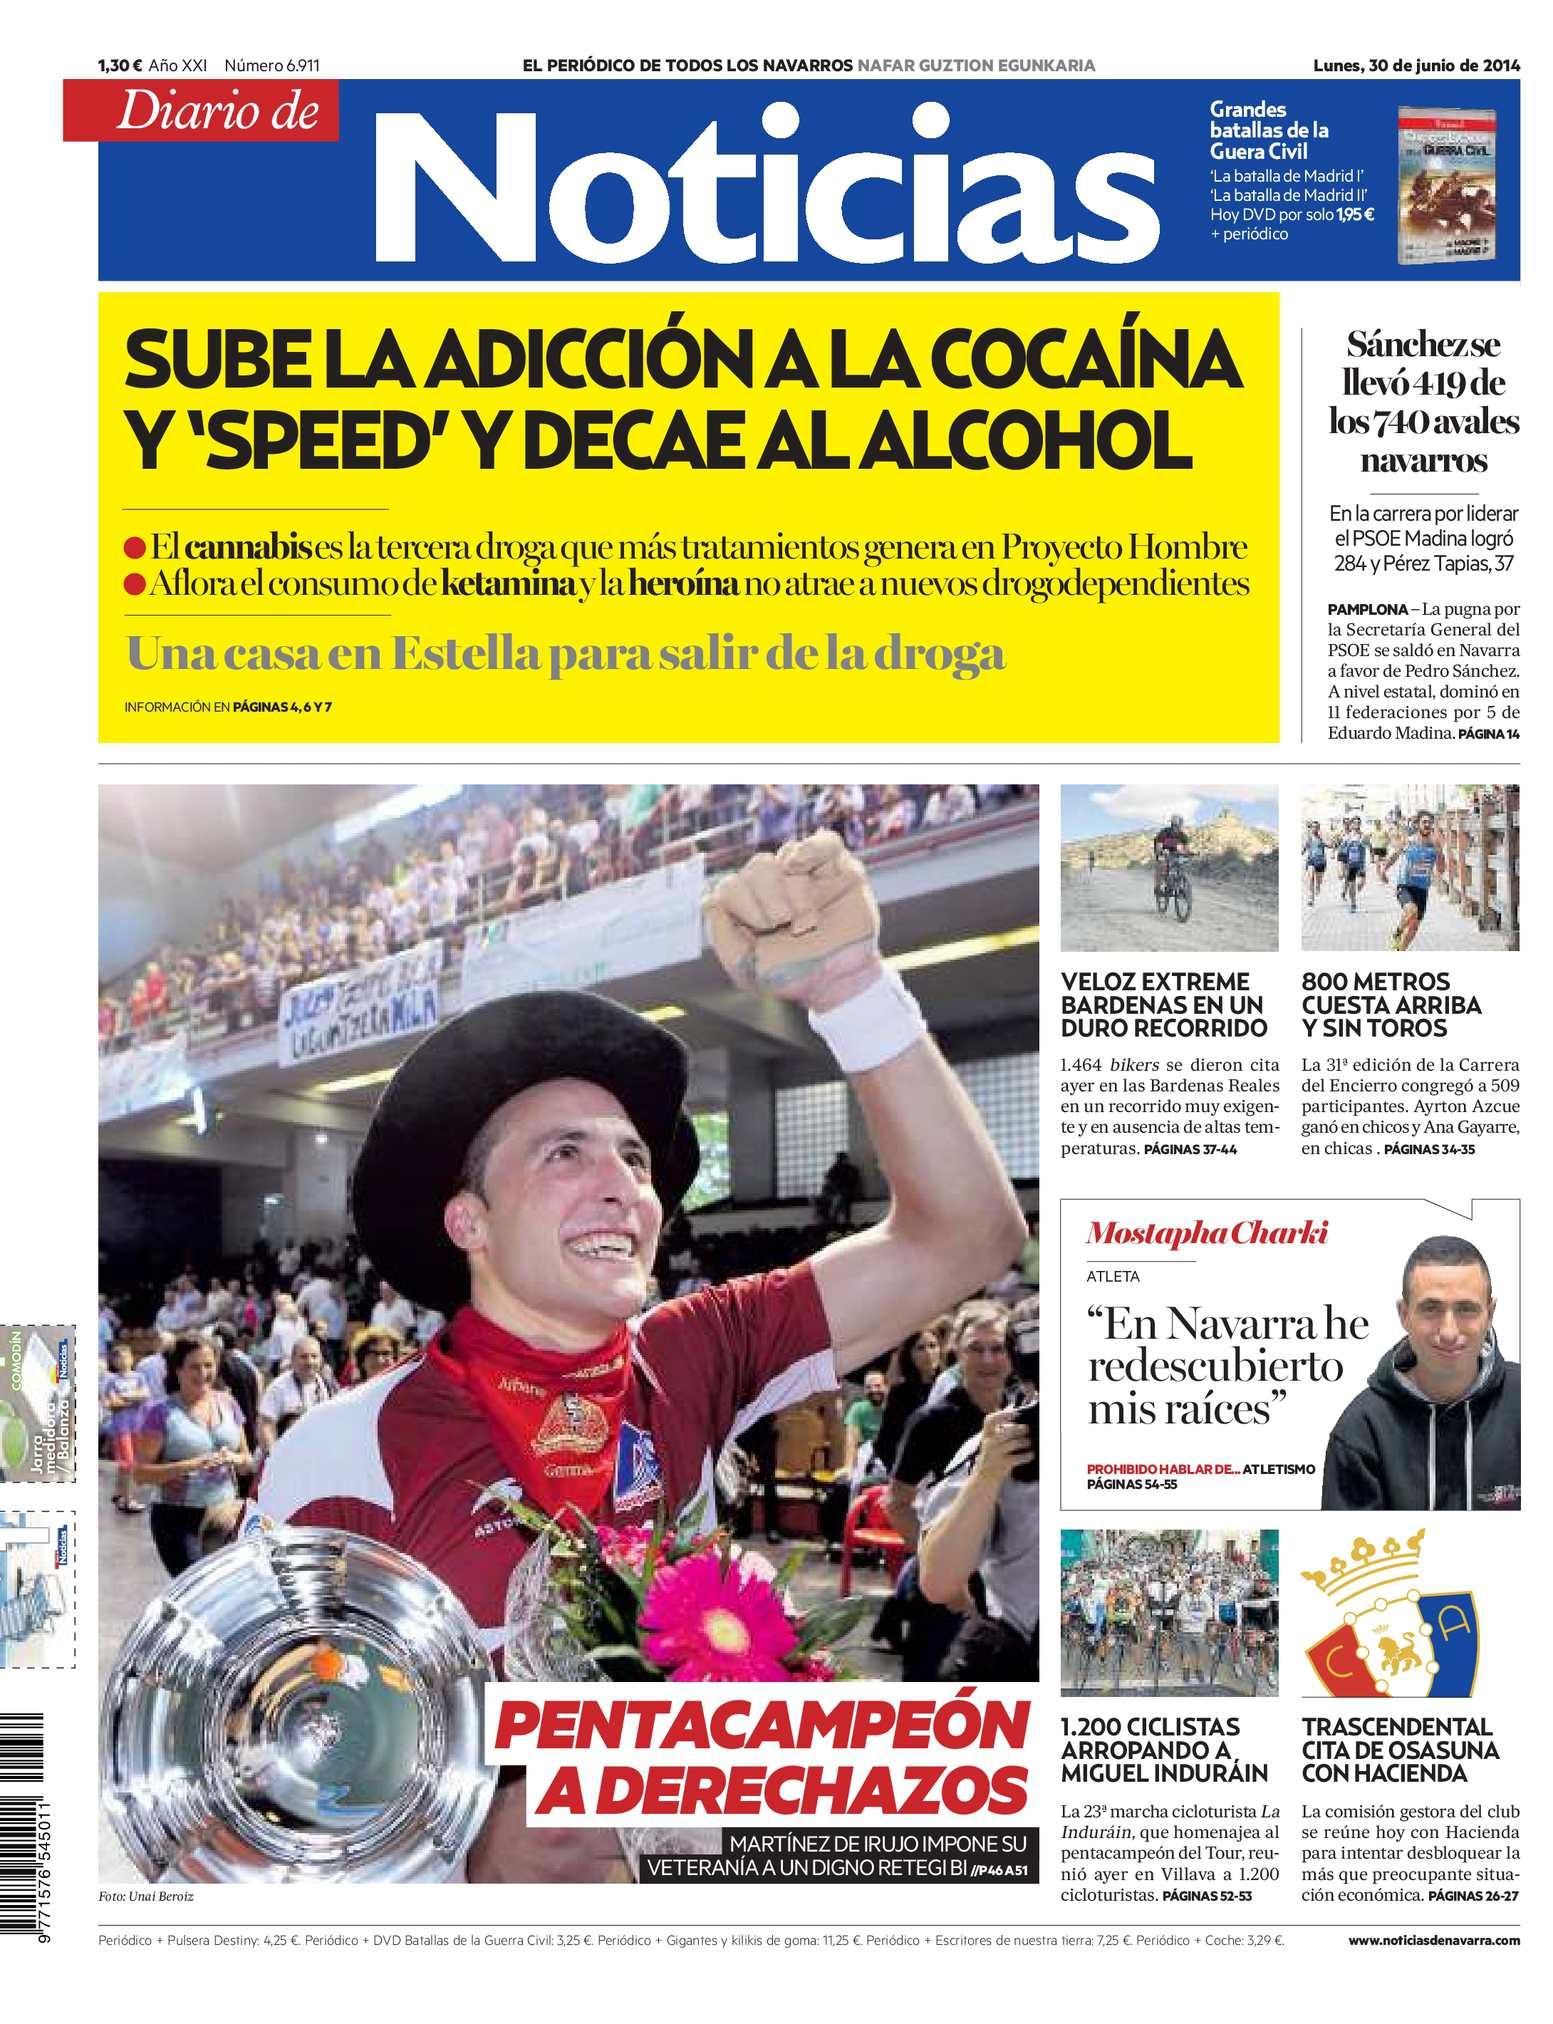 De 20140630 Diario Noticias Calaméo UMSGjpVqLz